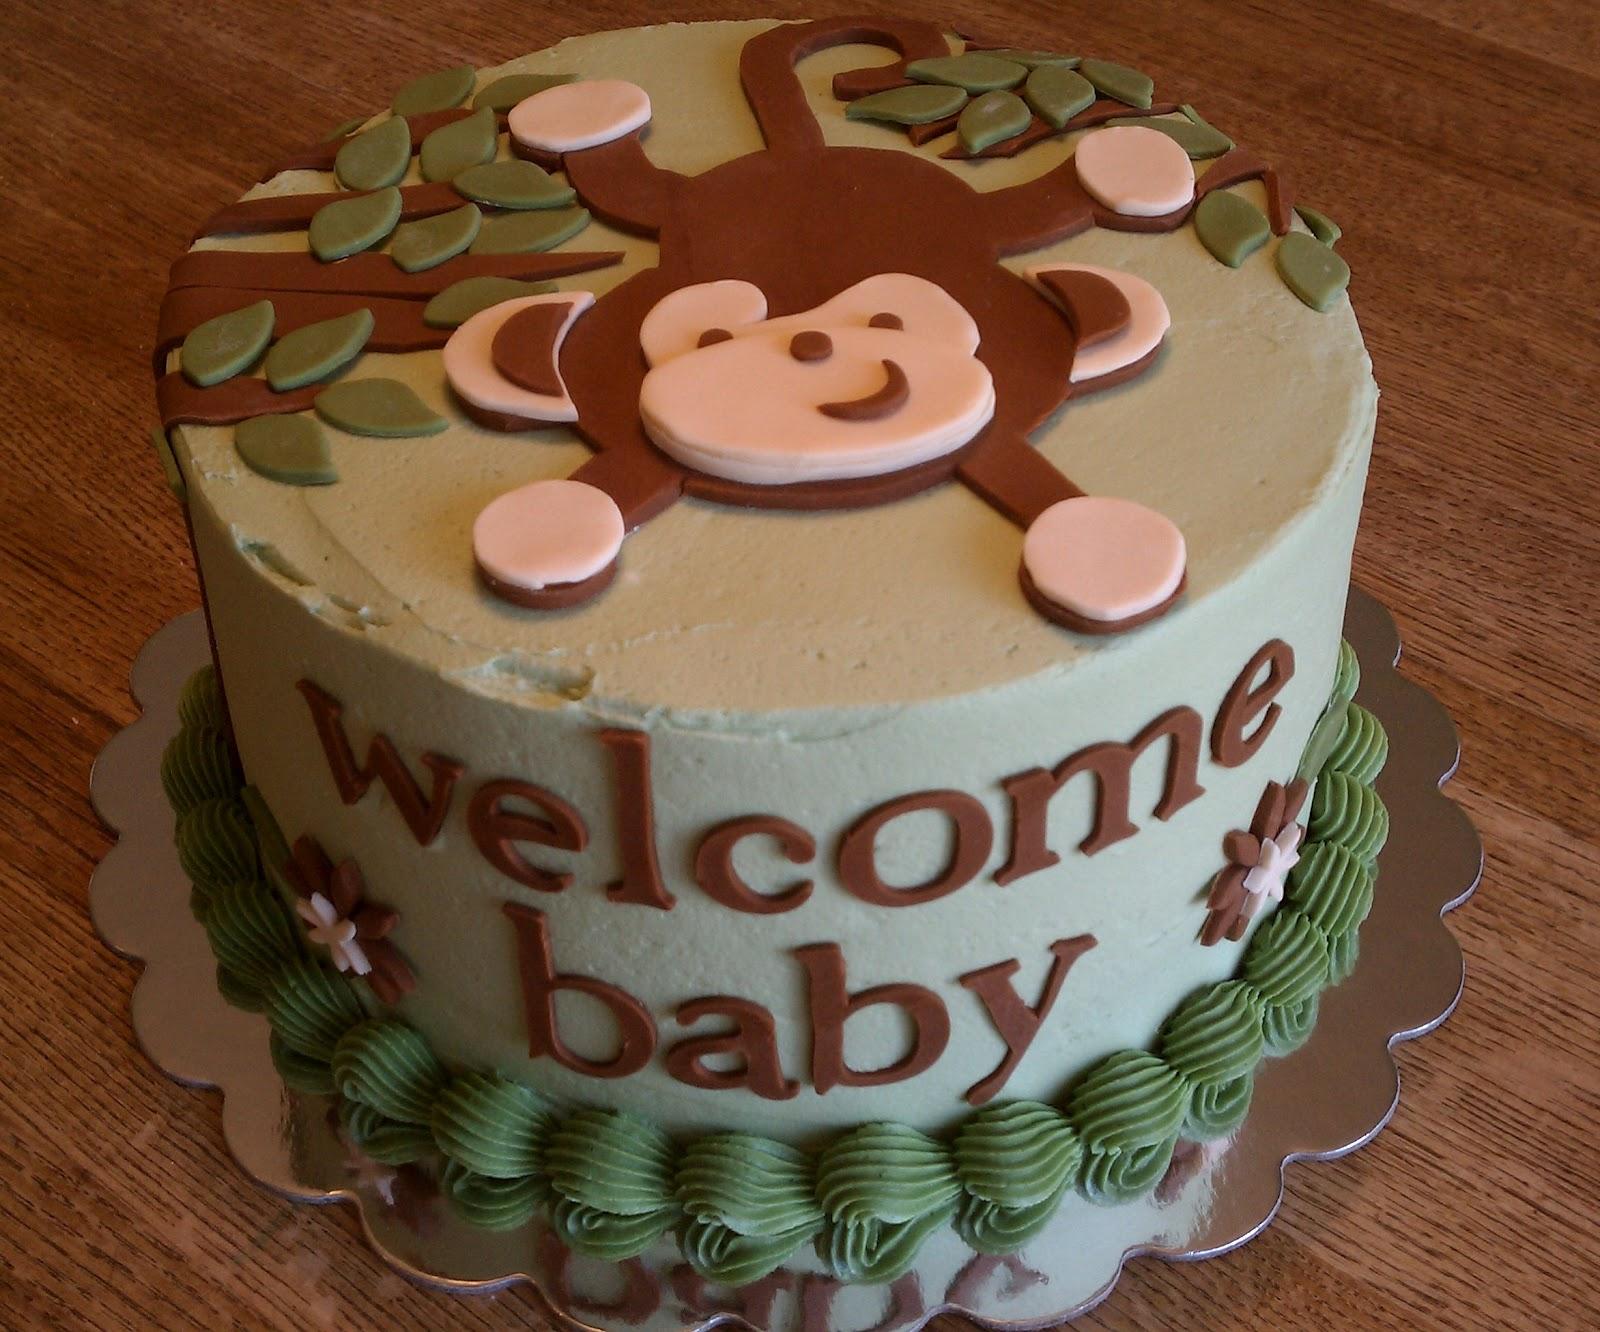 Baby shower cakes on pinterest baby boy cakes baby boy shower and monkey baby showers - Baby shower cakes monkey theme ...